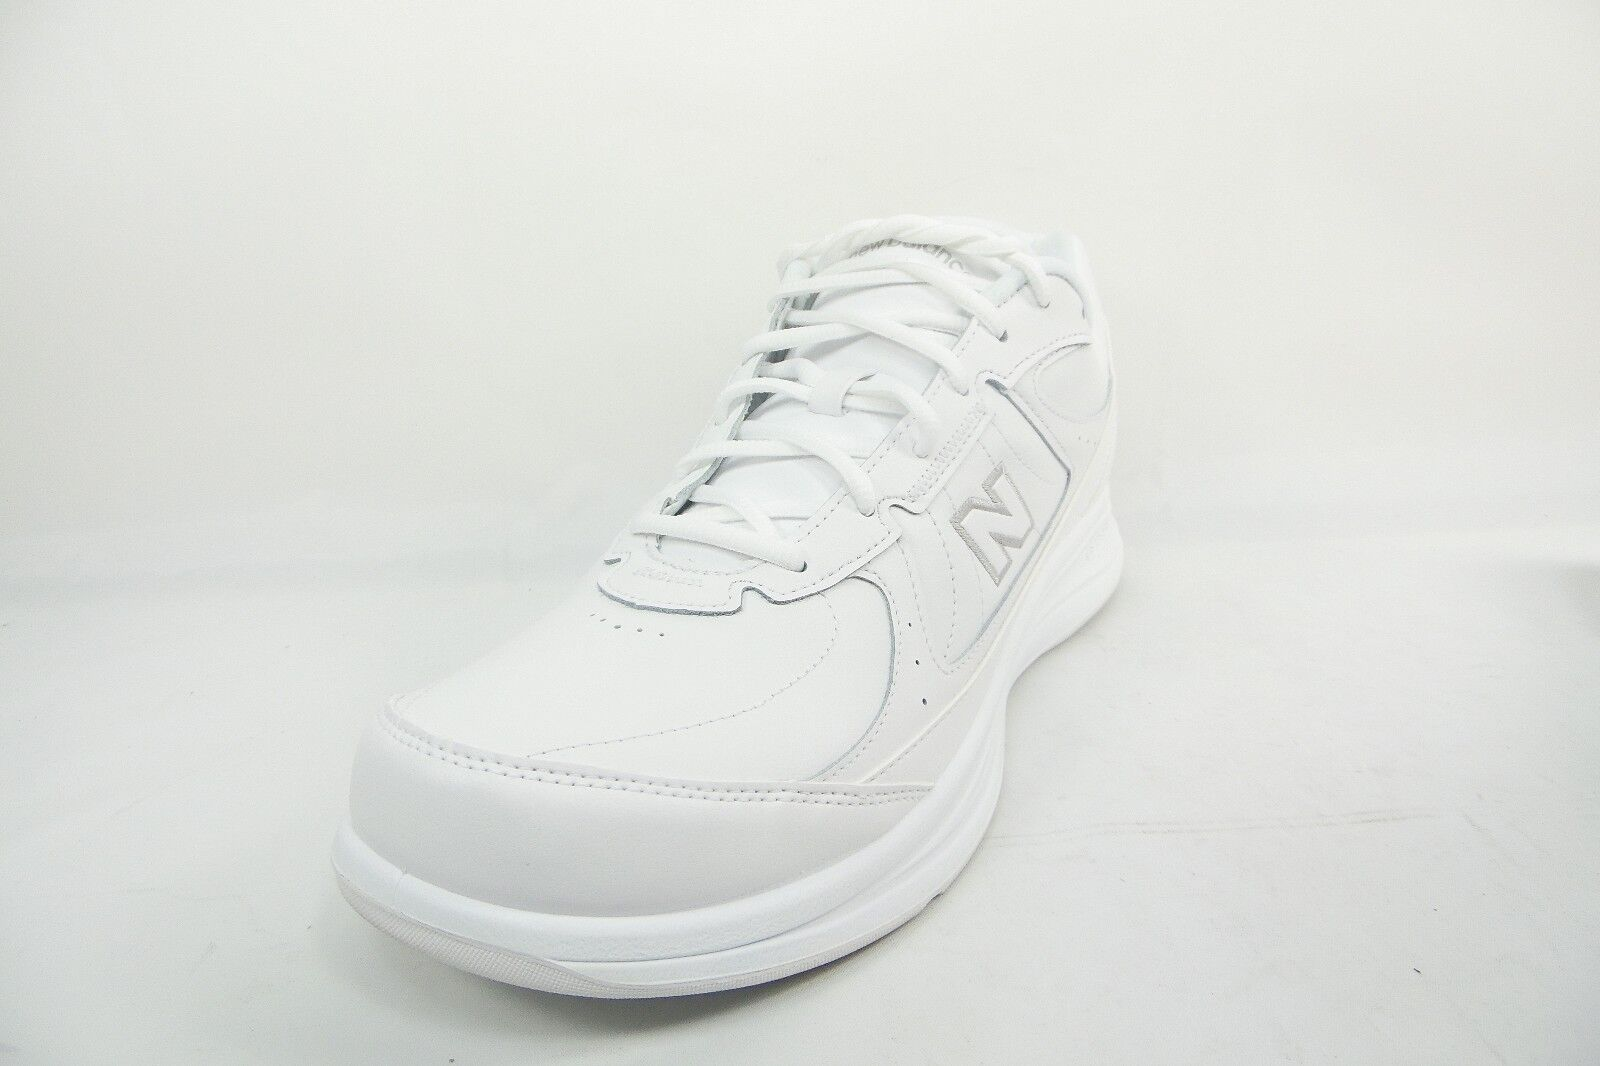 New Balance 577 Womens Walking Shoe White Size 8.5B WW577WT